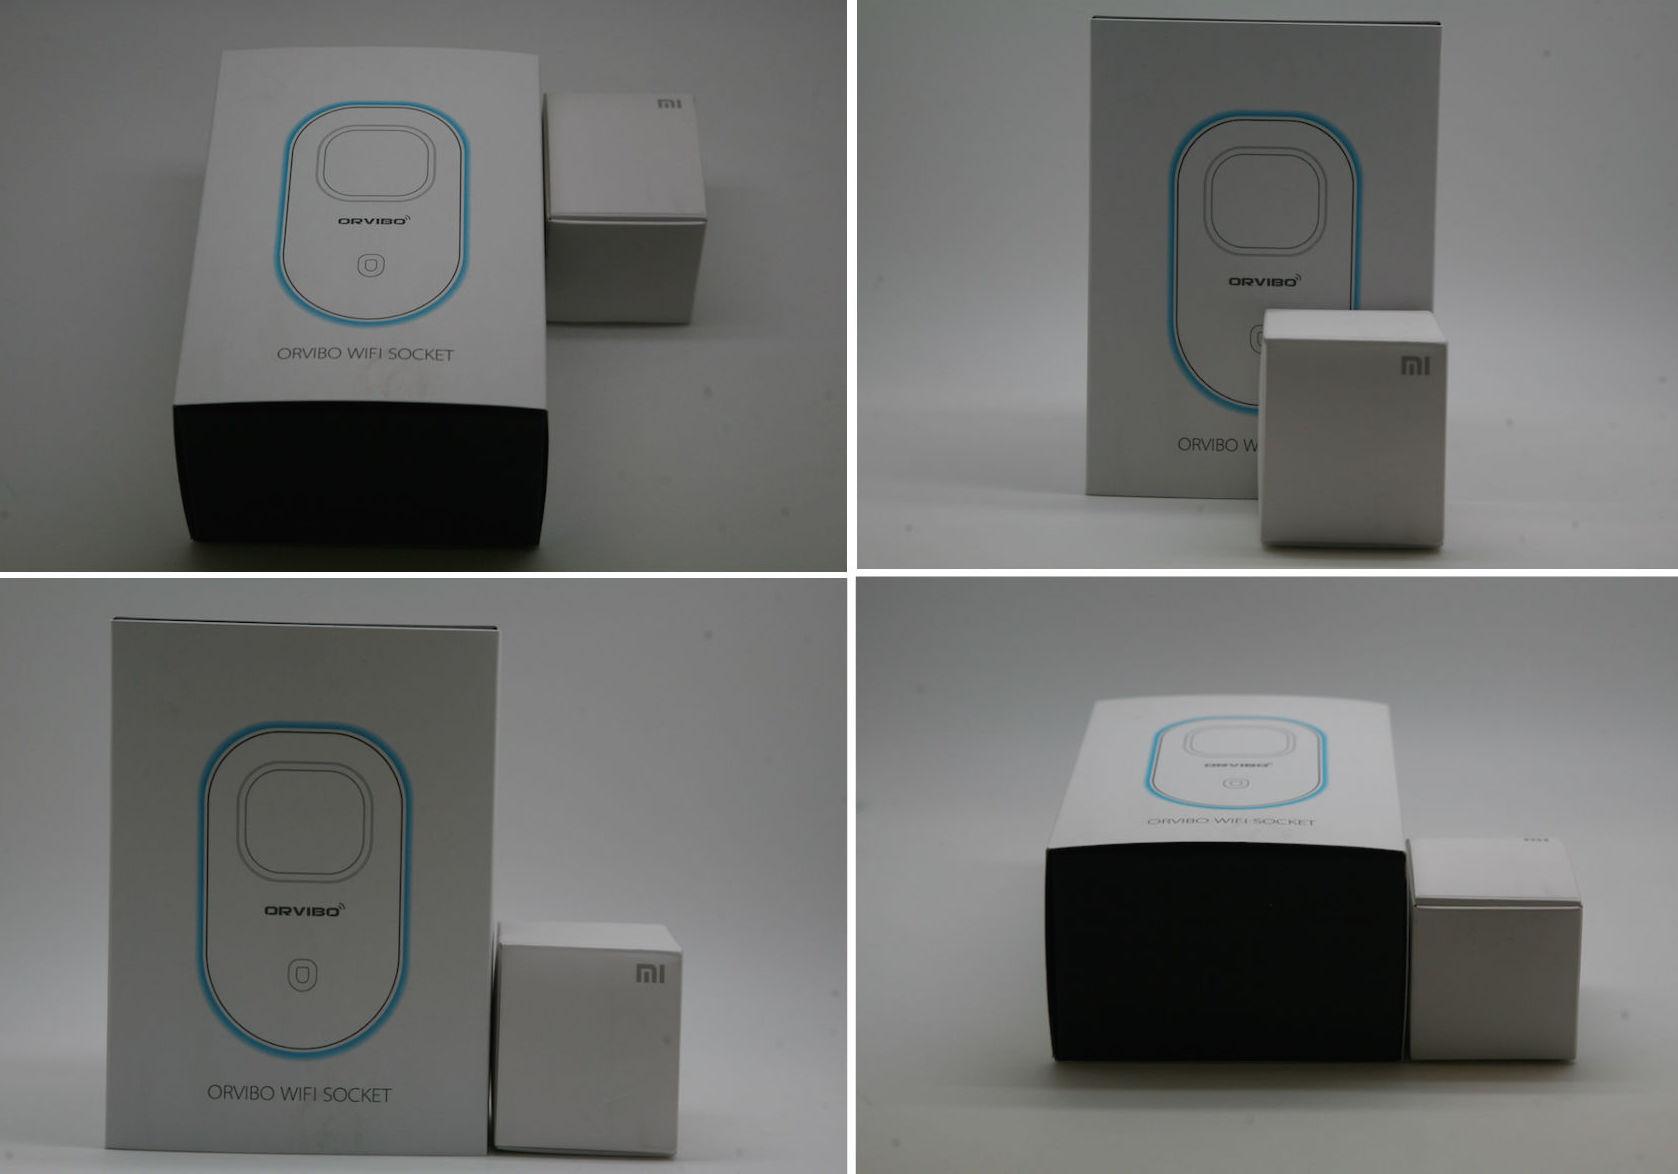 «Мимимишная» розетка: недлинное сравнение розетки Xiaomi и Orvibo - 3